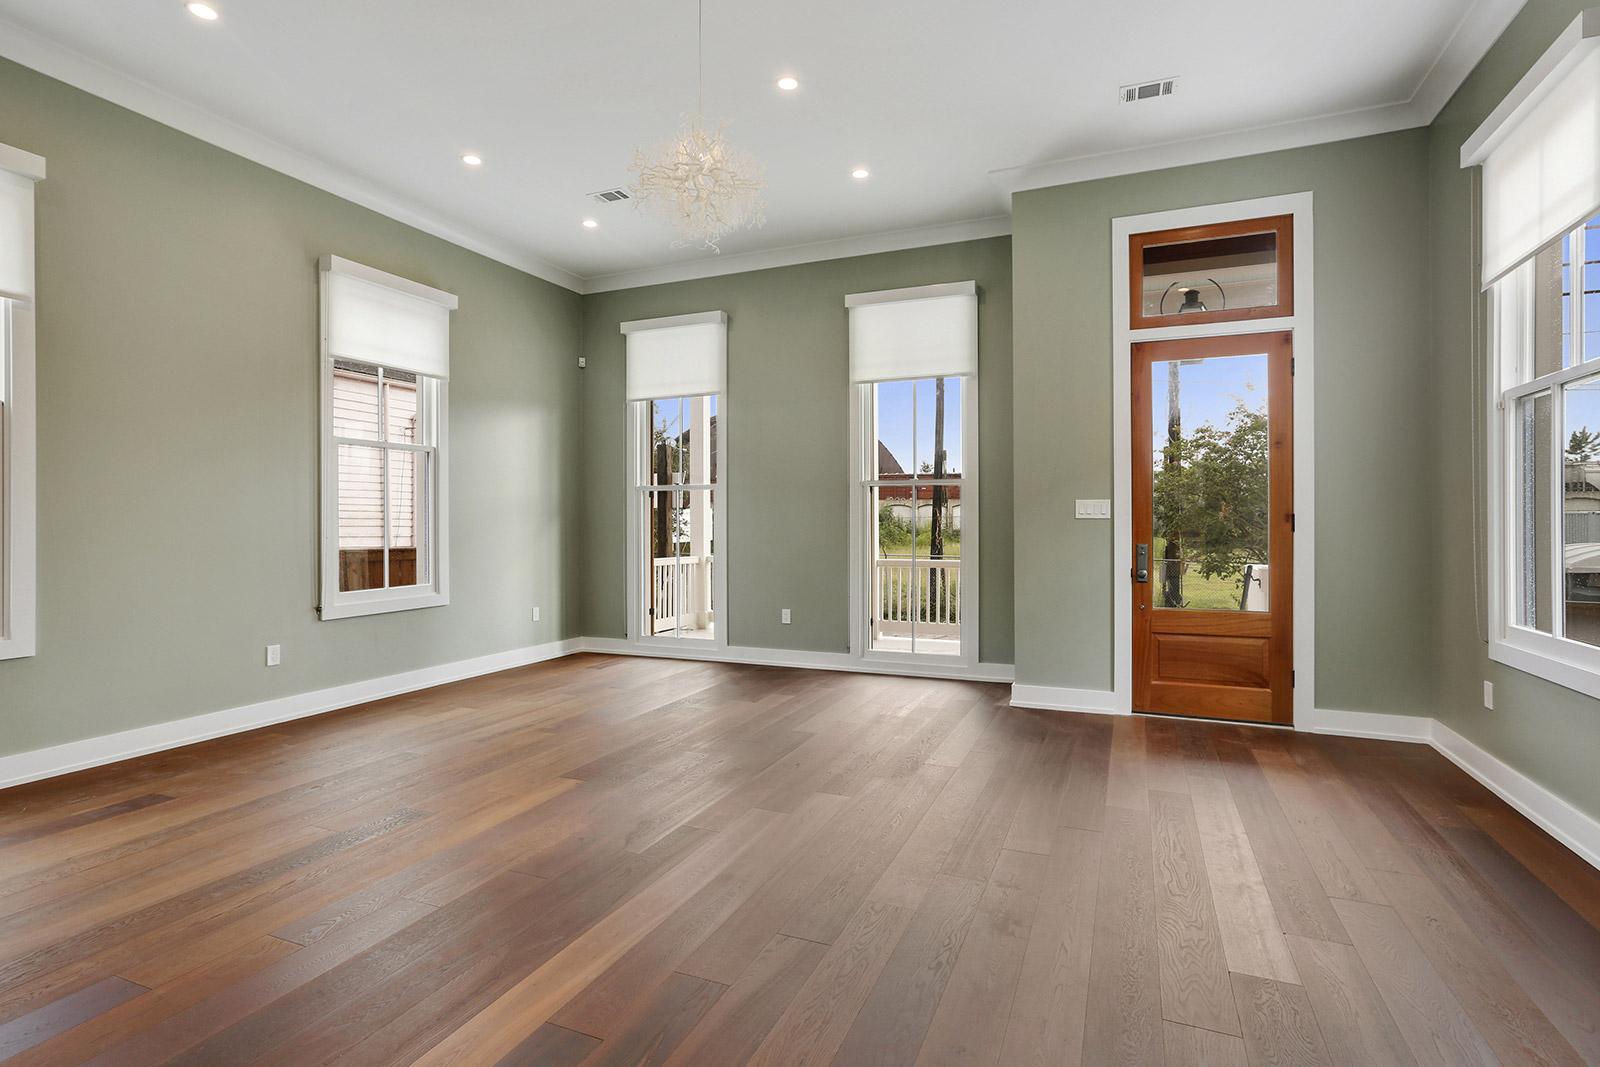 Living Room with unique light fixture and view of the Corten Steel Rainbow Bridge